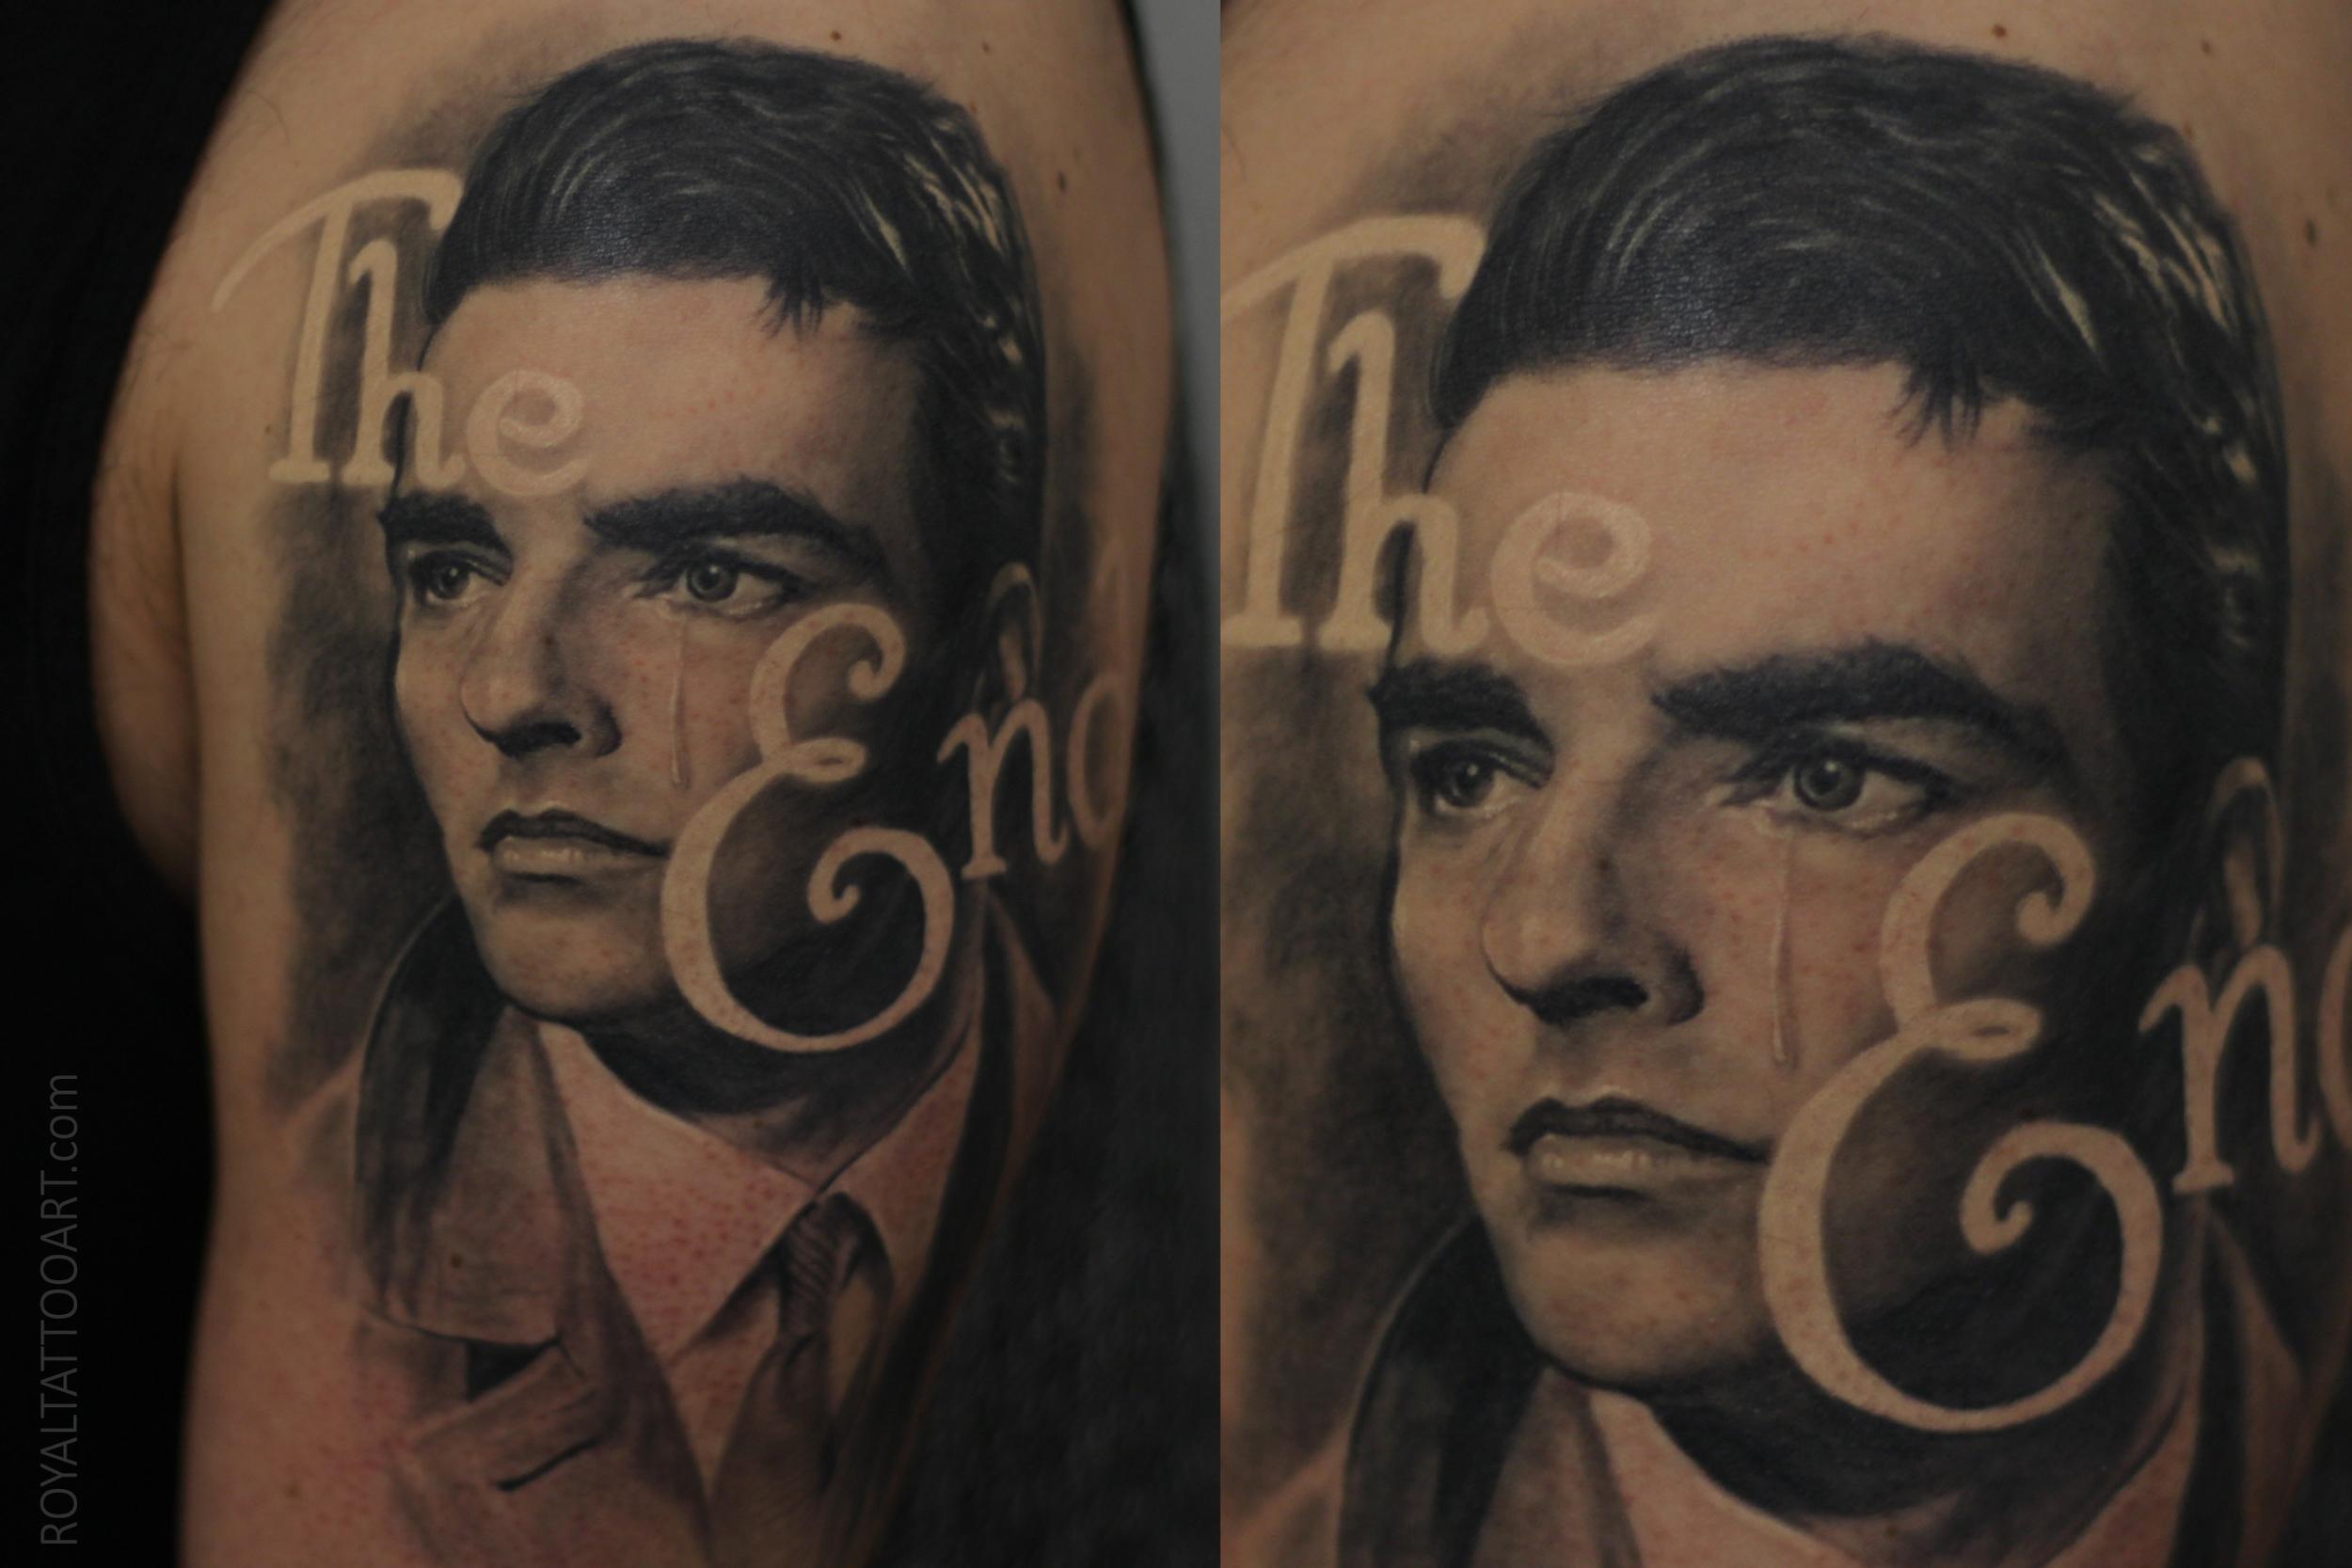 Montgomery Clift tattoo portrait black and grey realism realistic nyc art artist tattooing bng tattoo.jpg